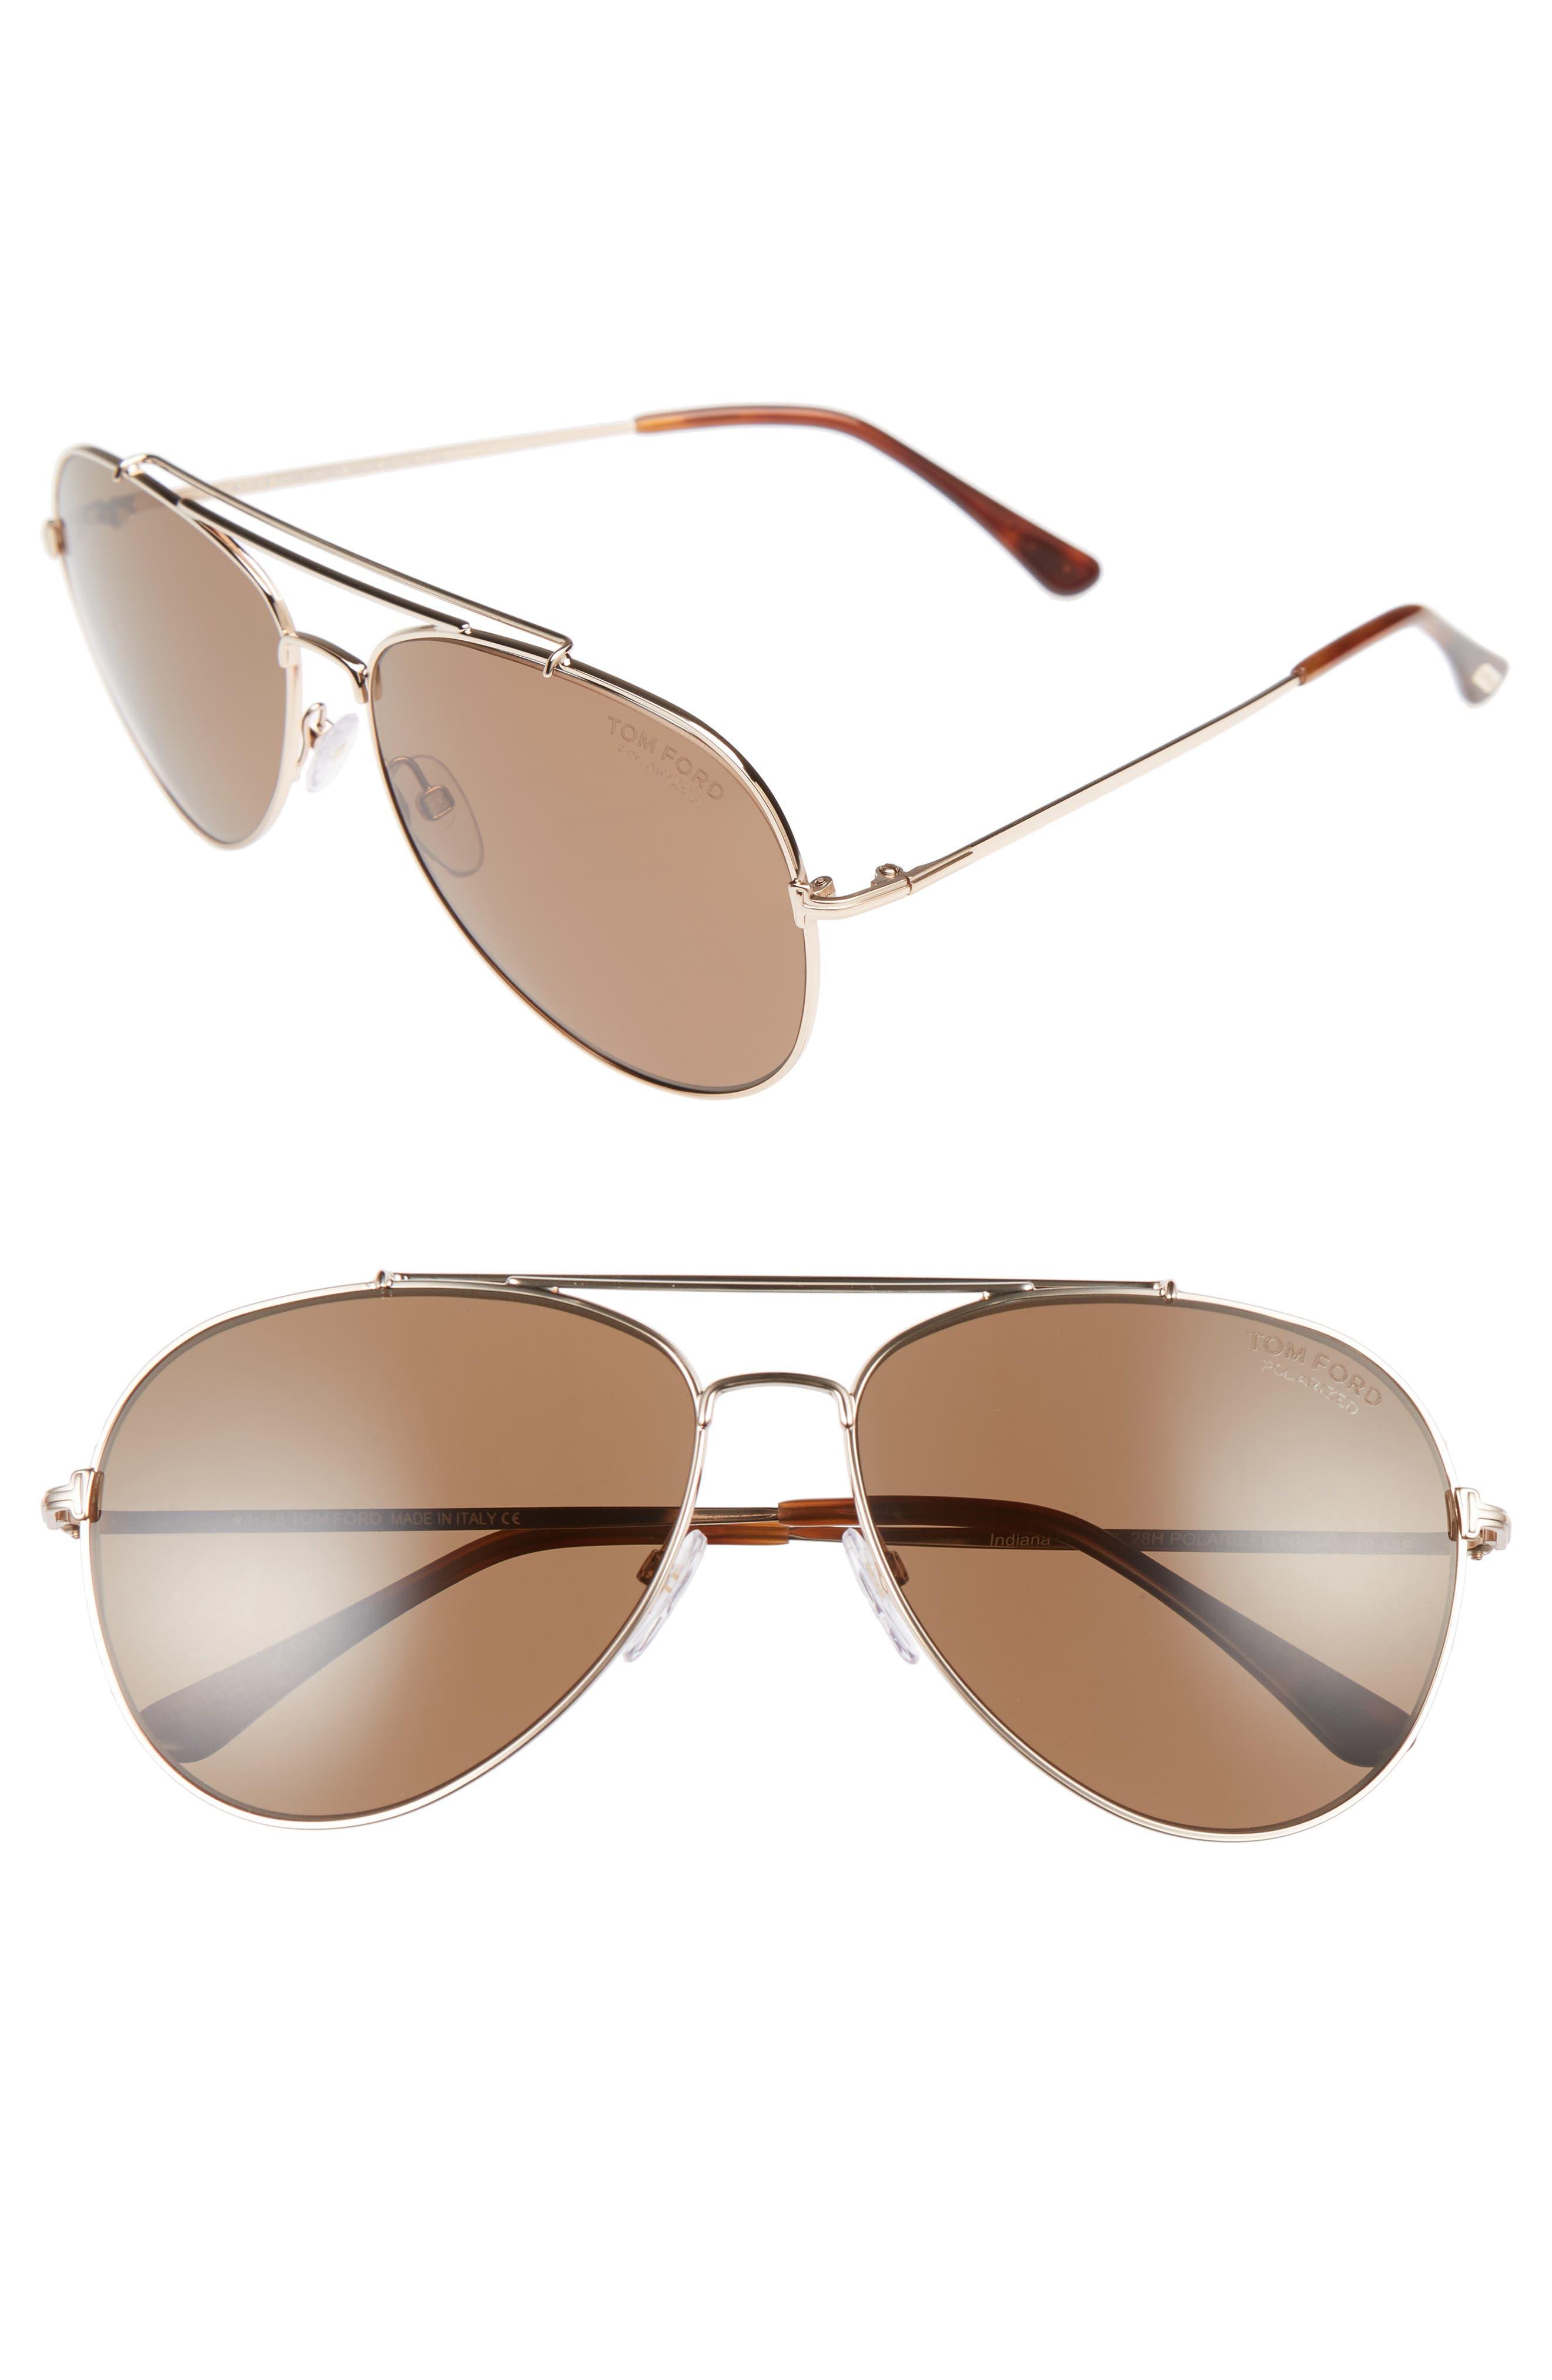 Indiana 60mm Polarized Aviator Sunglasses,                         Main,                         color, Shiny Rose Gold/ Light Brown